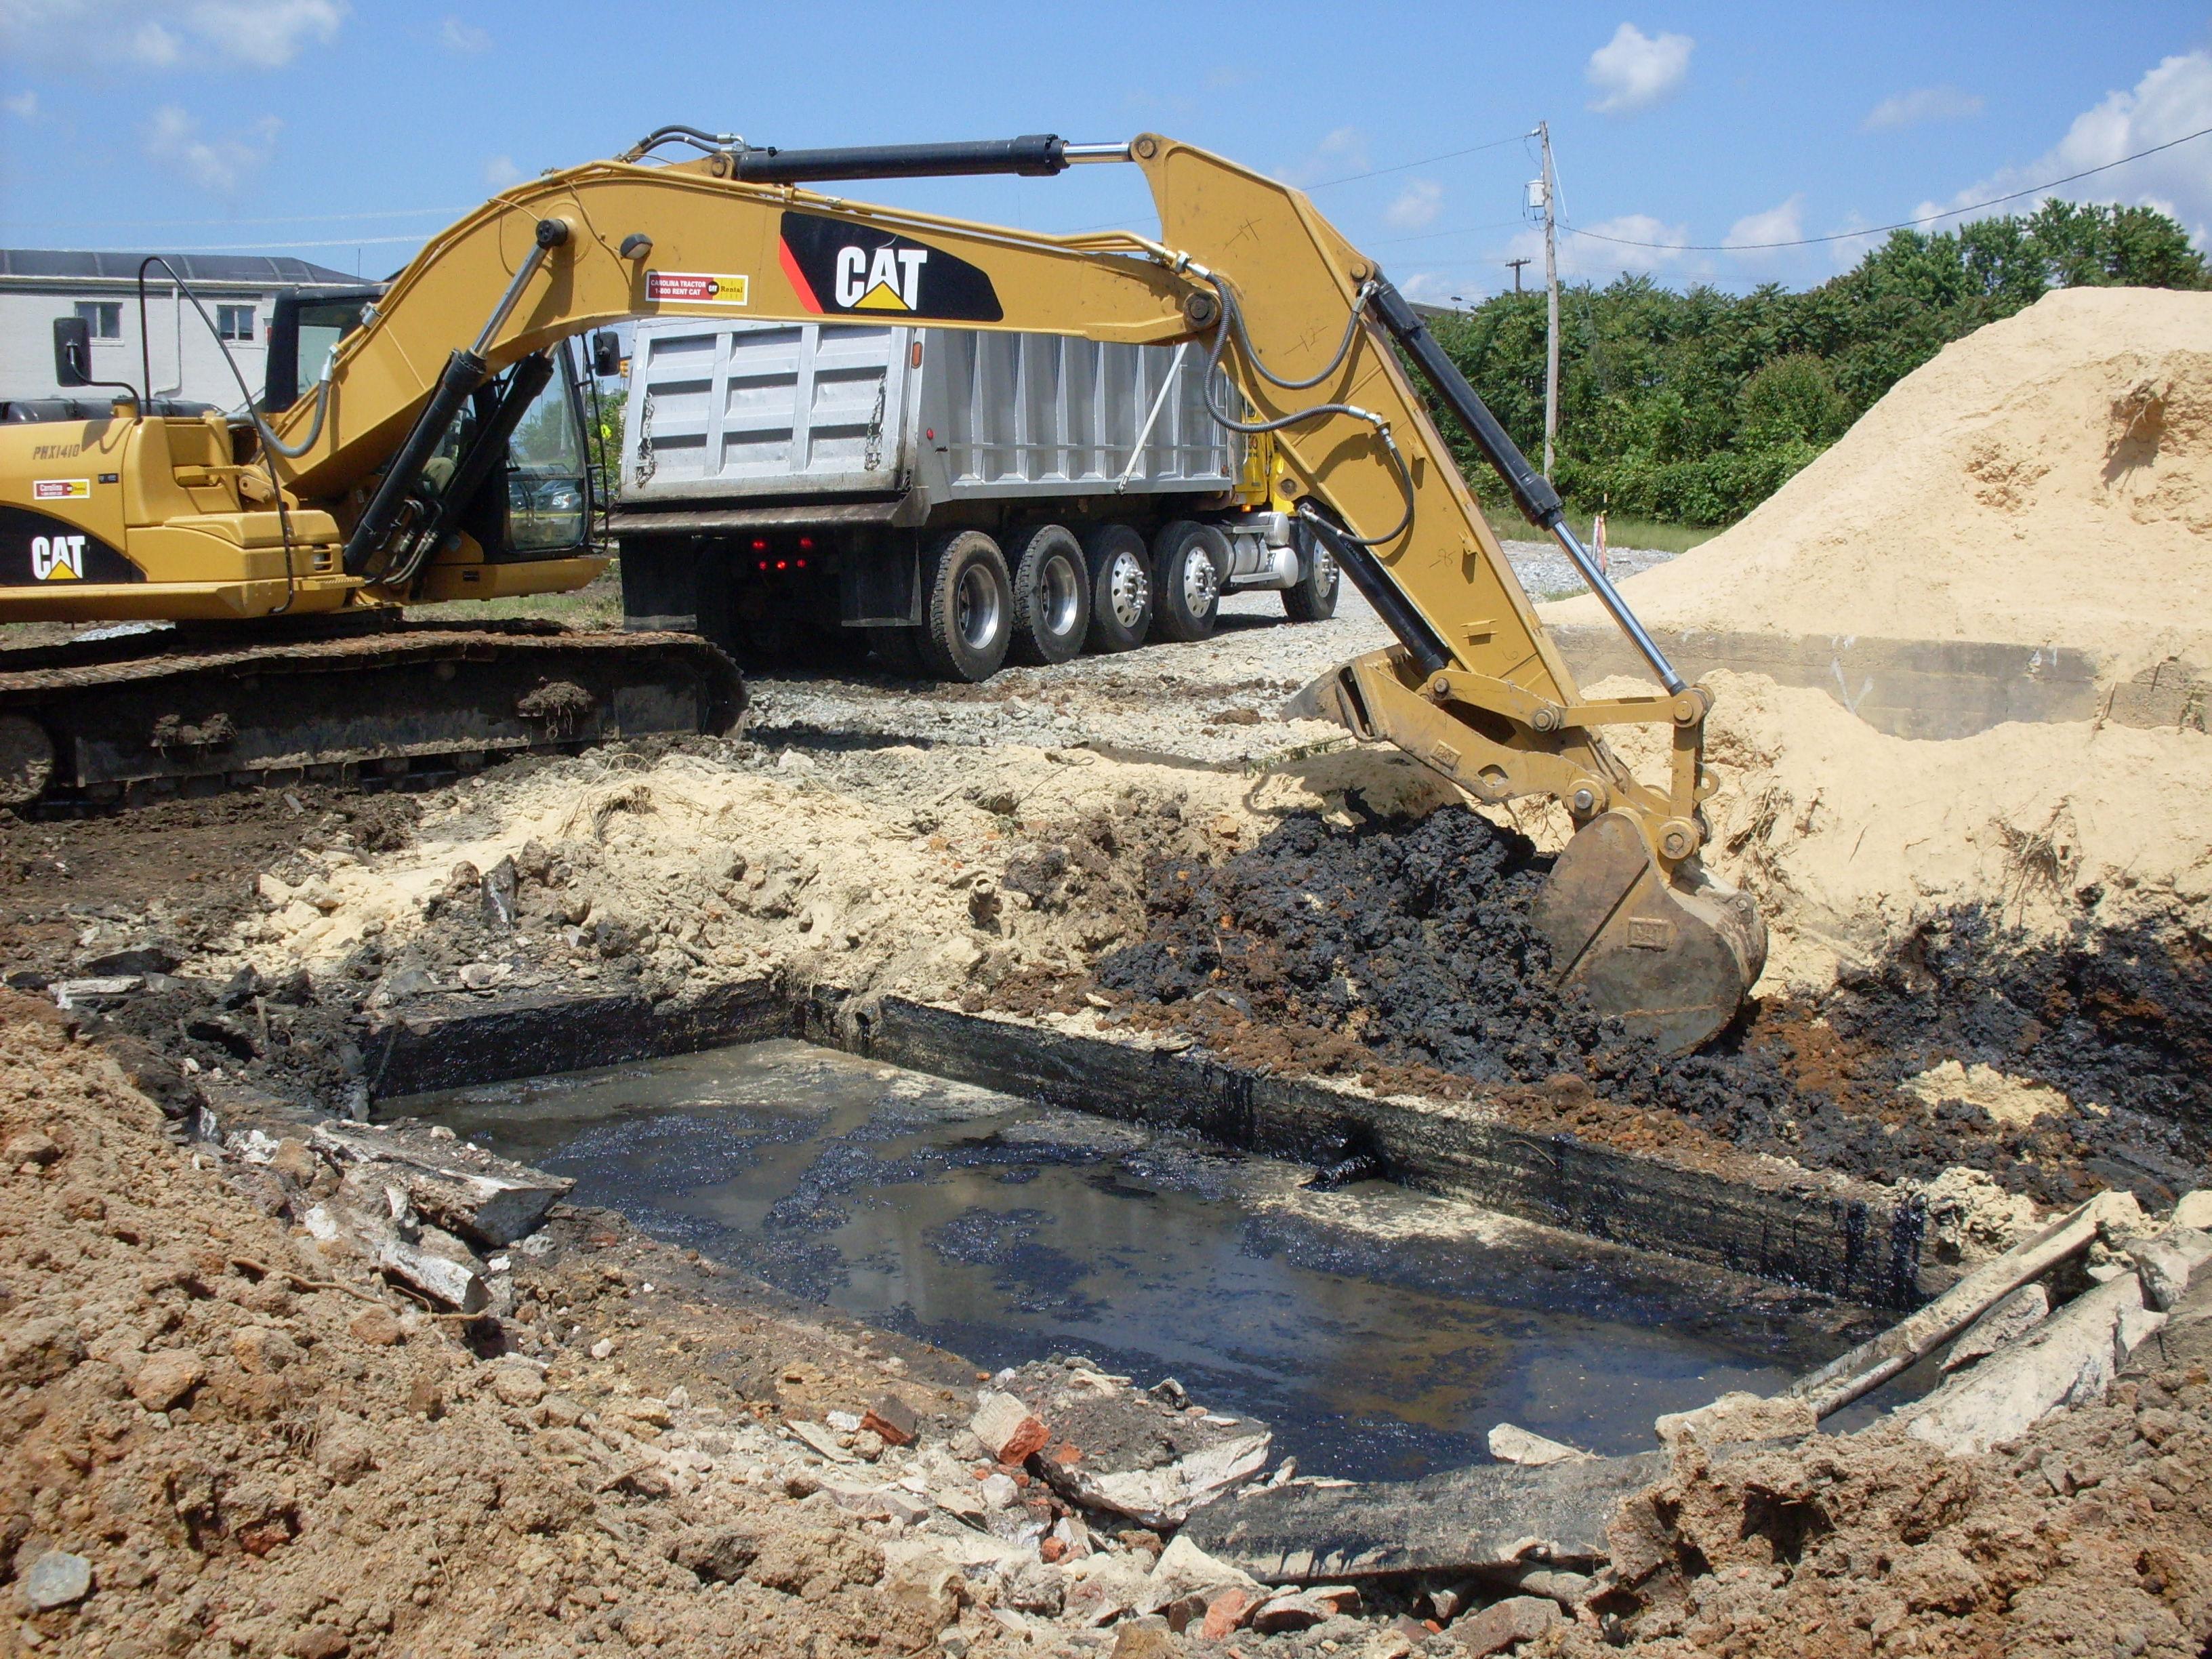 Using soil mixing equipment to address in situ soil remediation ...